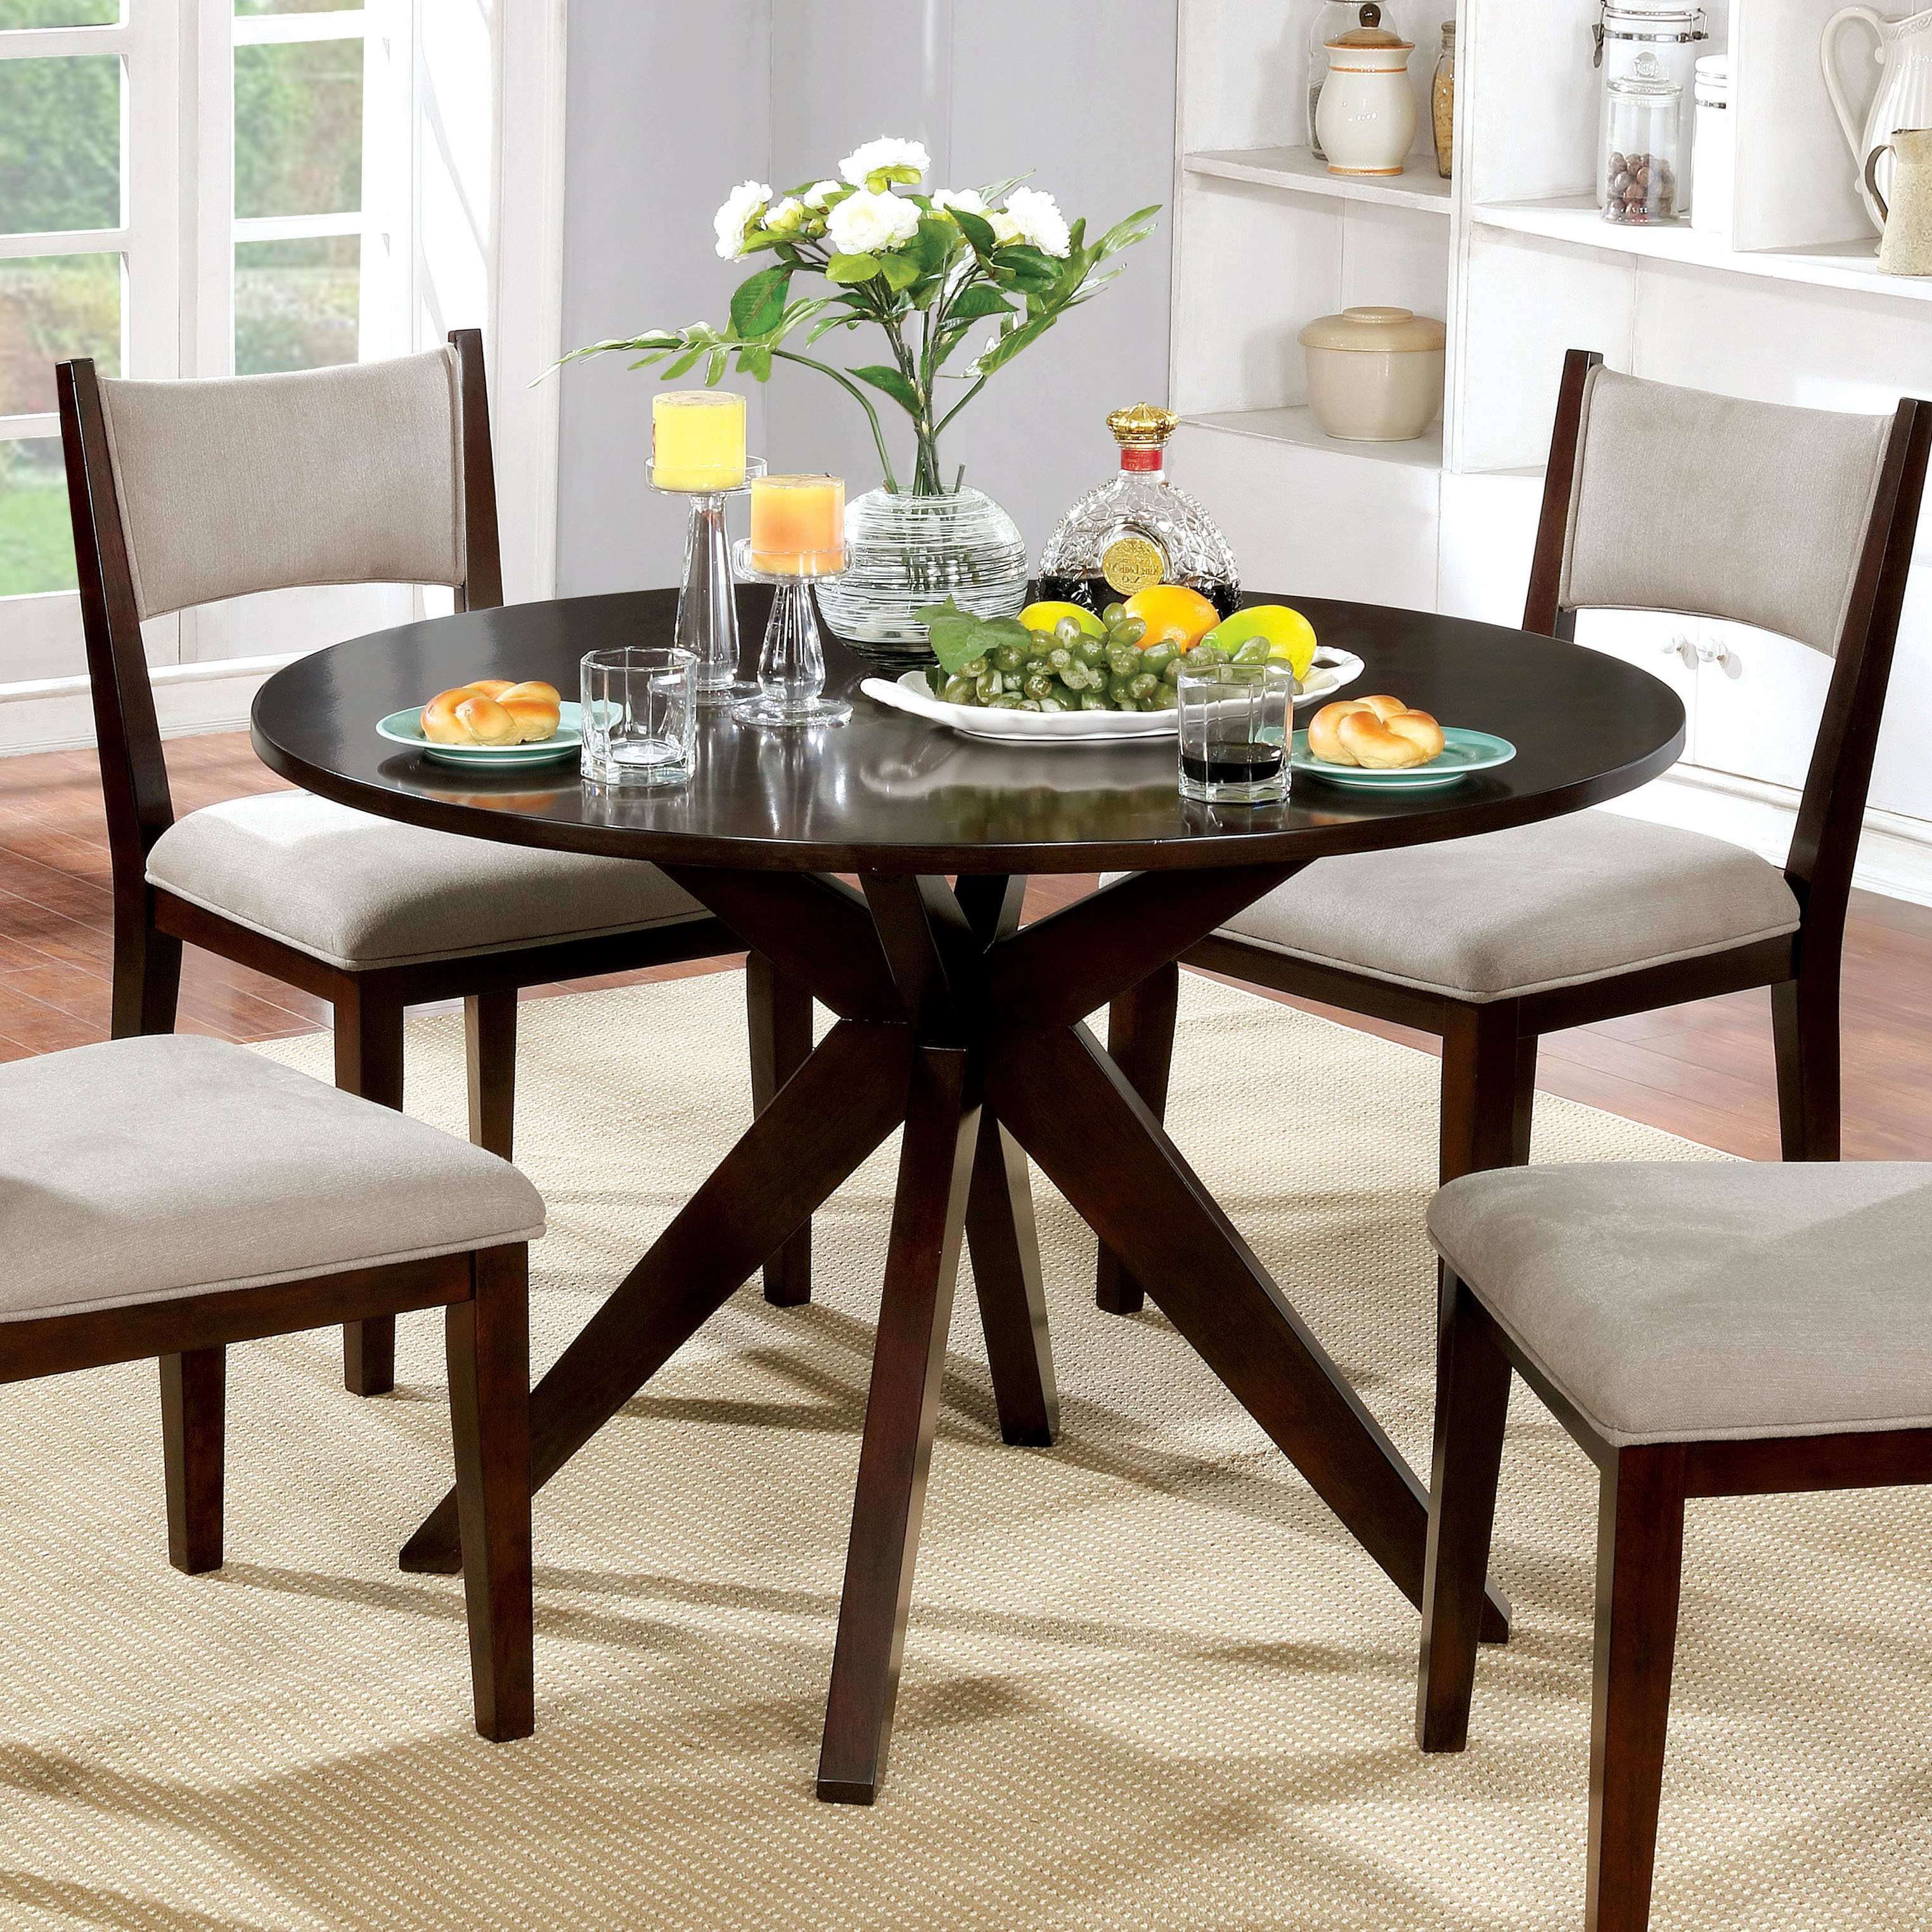 Famous Kiara Sofa Chairs Regarding Shop Furniture Of America Kiara Mid Century Modern Brown Cherry Wood (Gallery 18 of 20)